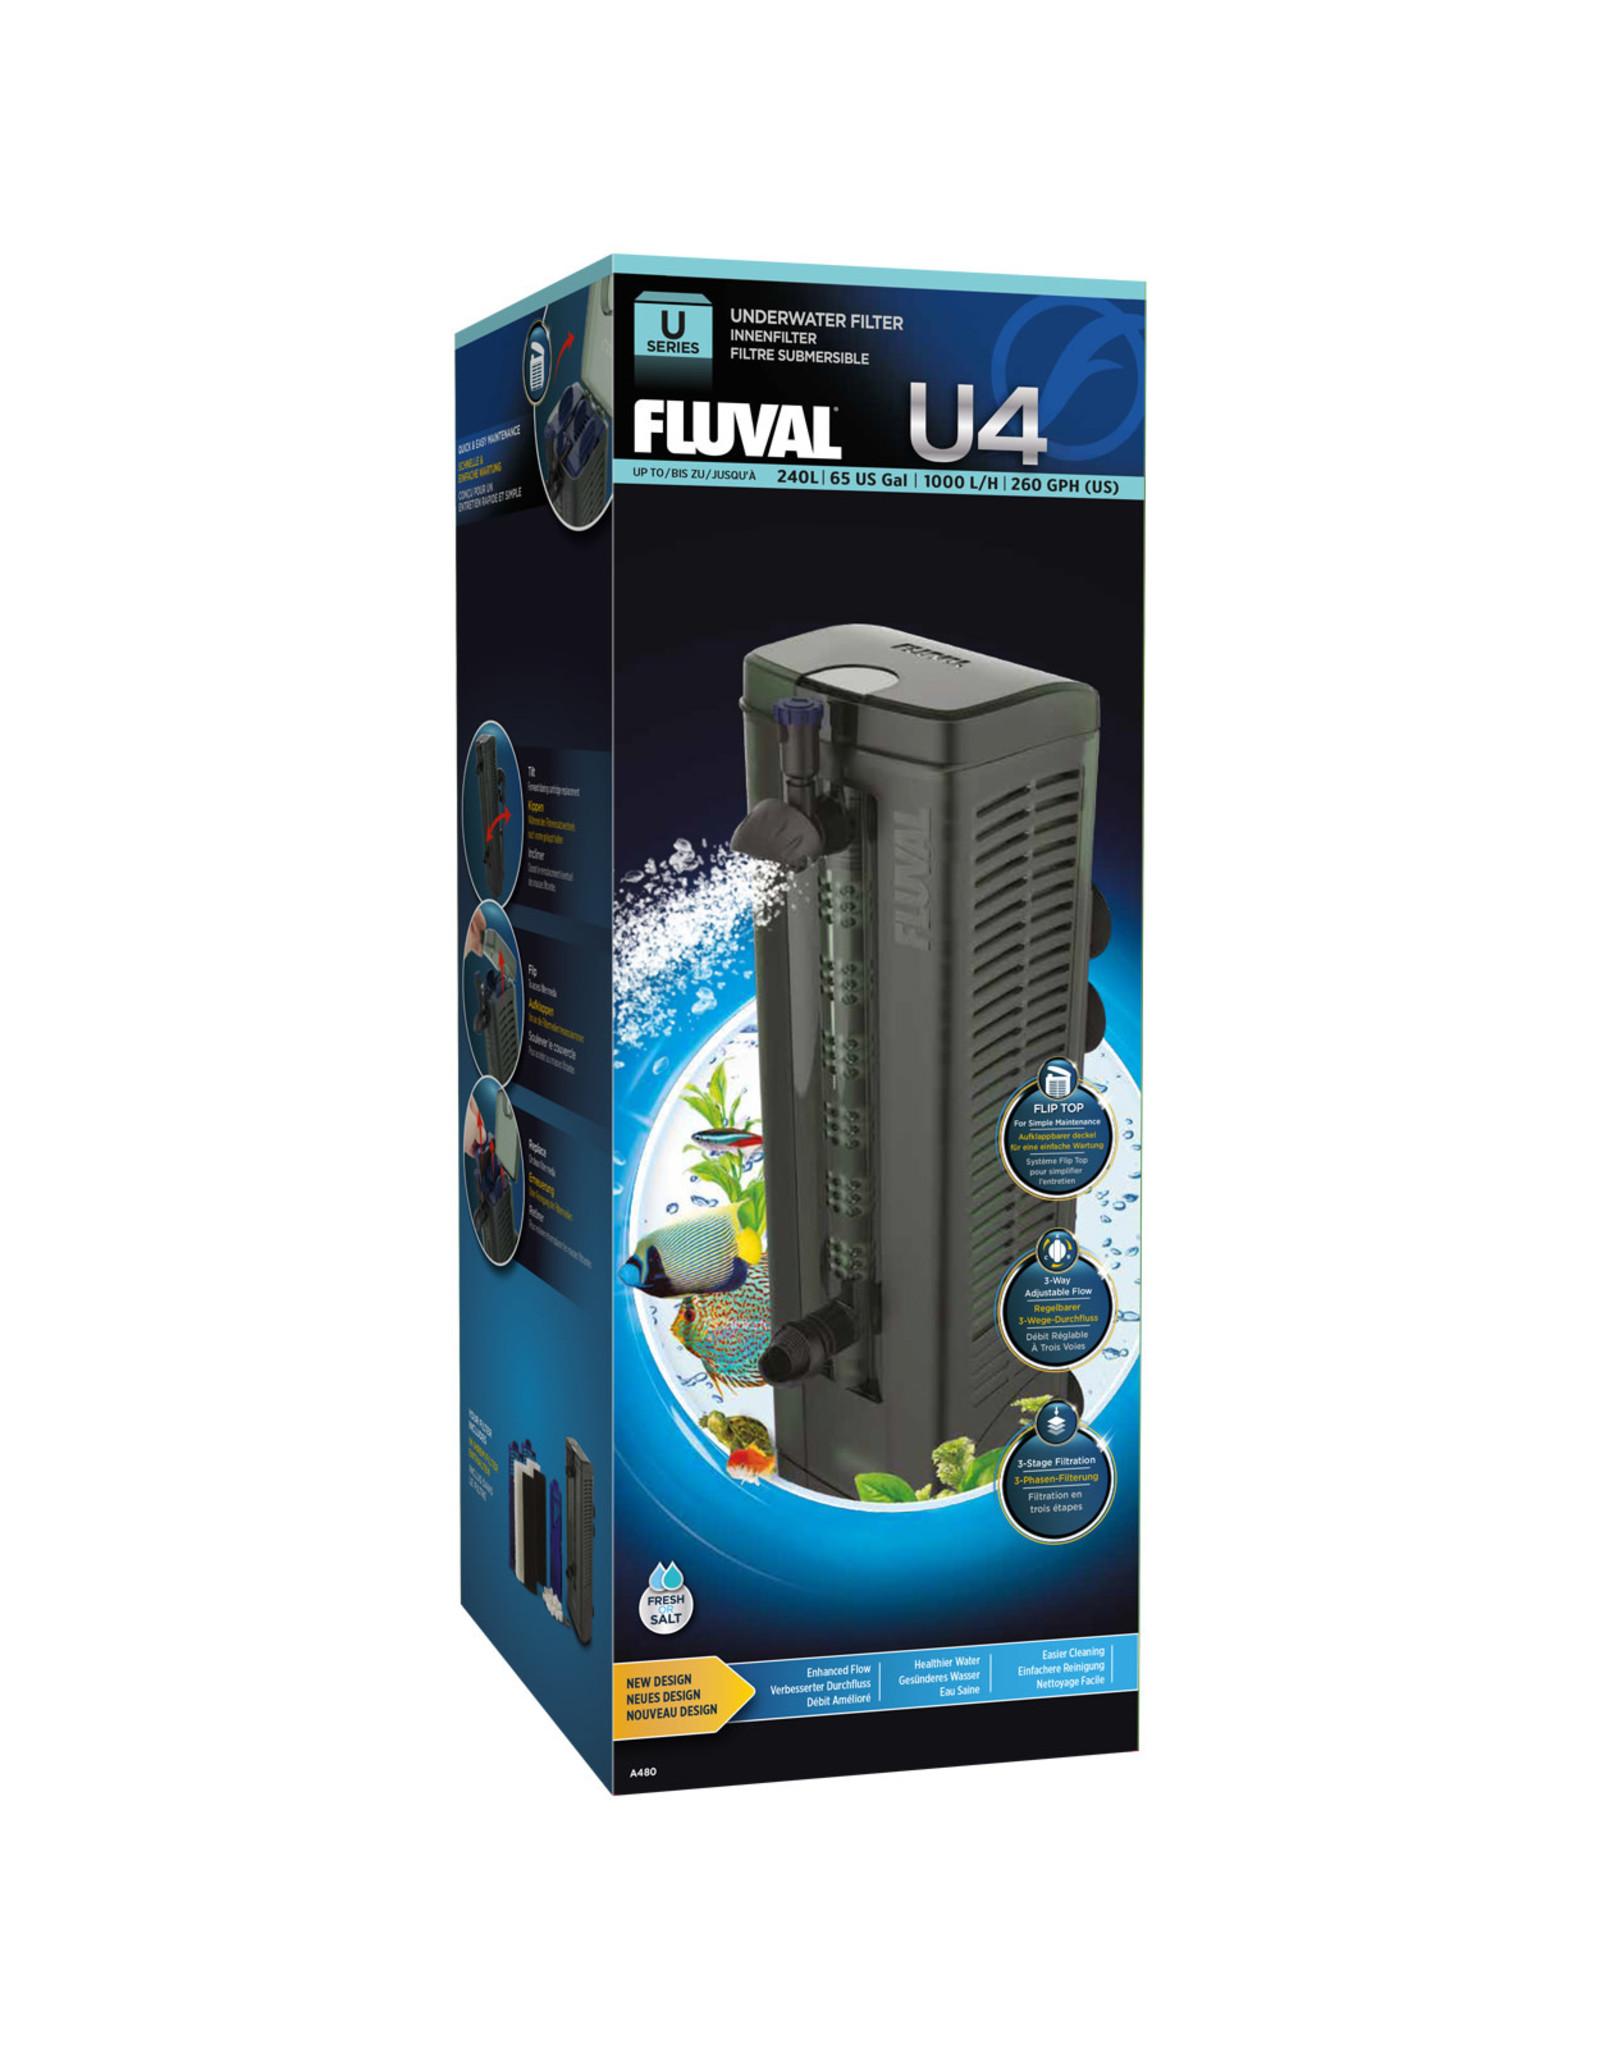 Fluval Fluval U4 Underwater Filter - 240 L (65 US Gal)